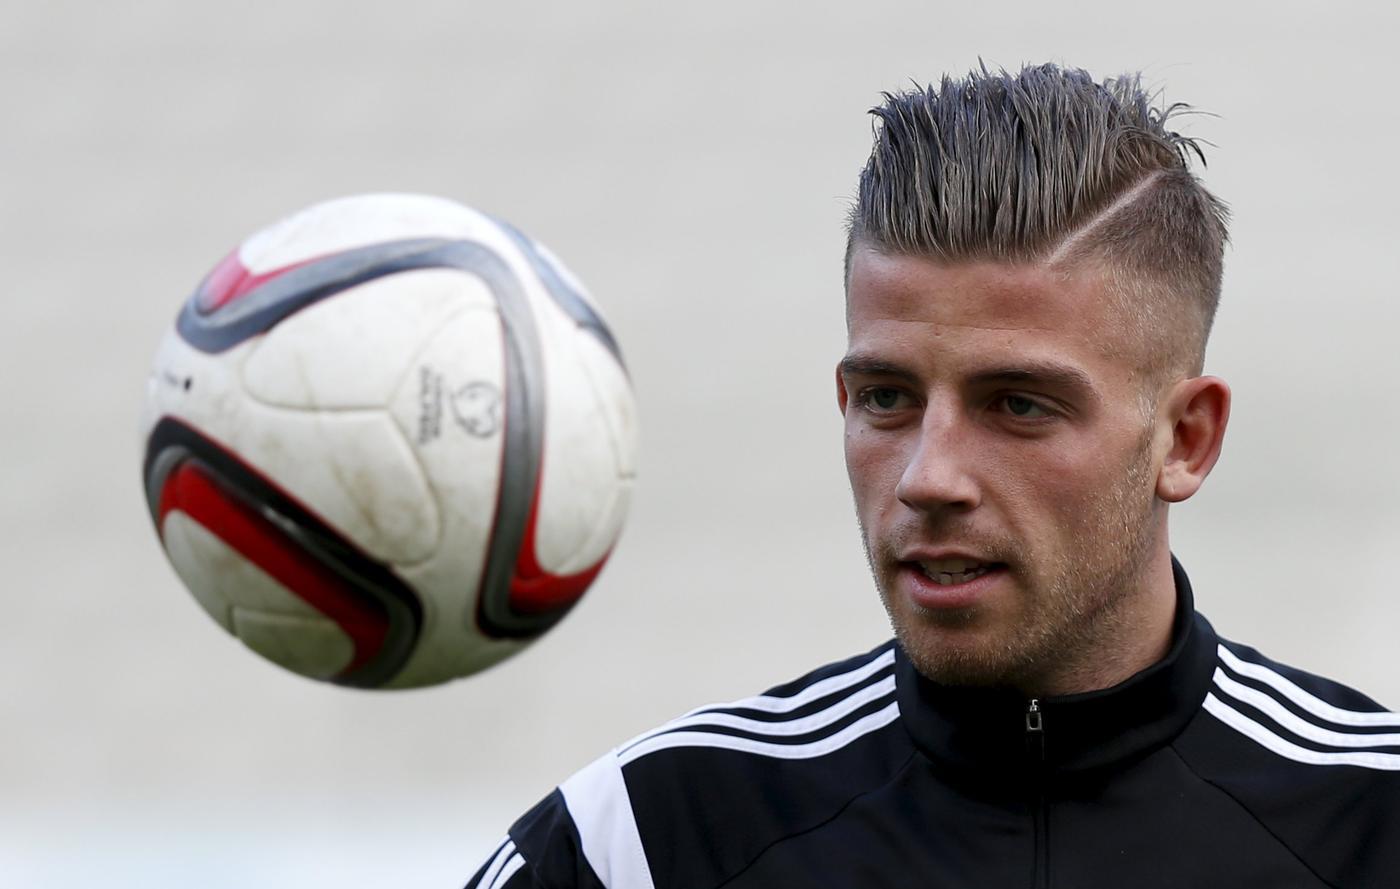 Atletico Madrid's Toby Alderweireld set to complete £9.2million transfer to Tottenham Hotspur